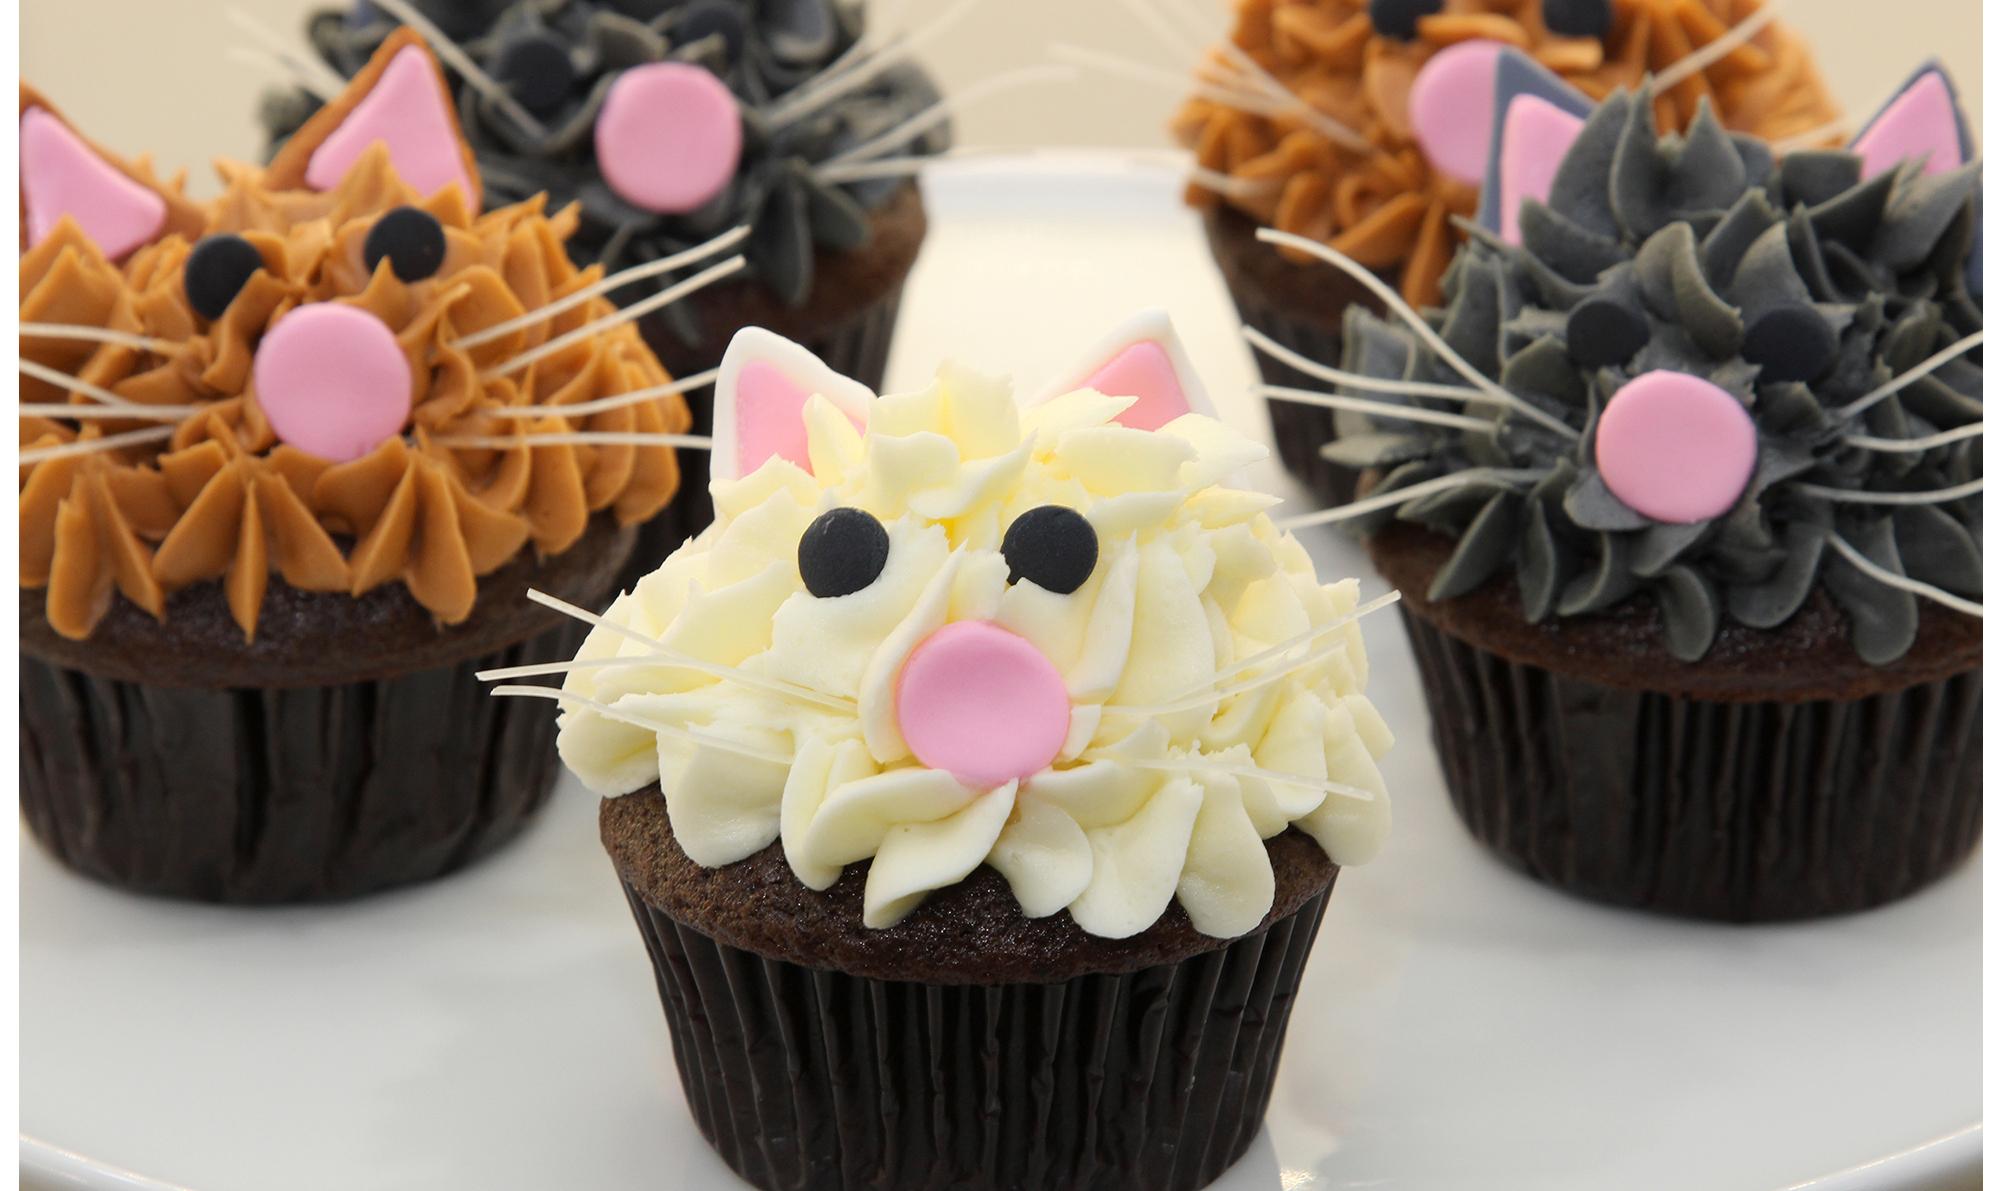 Chocolate Kitty Cupcakes